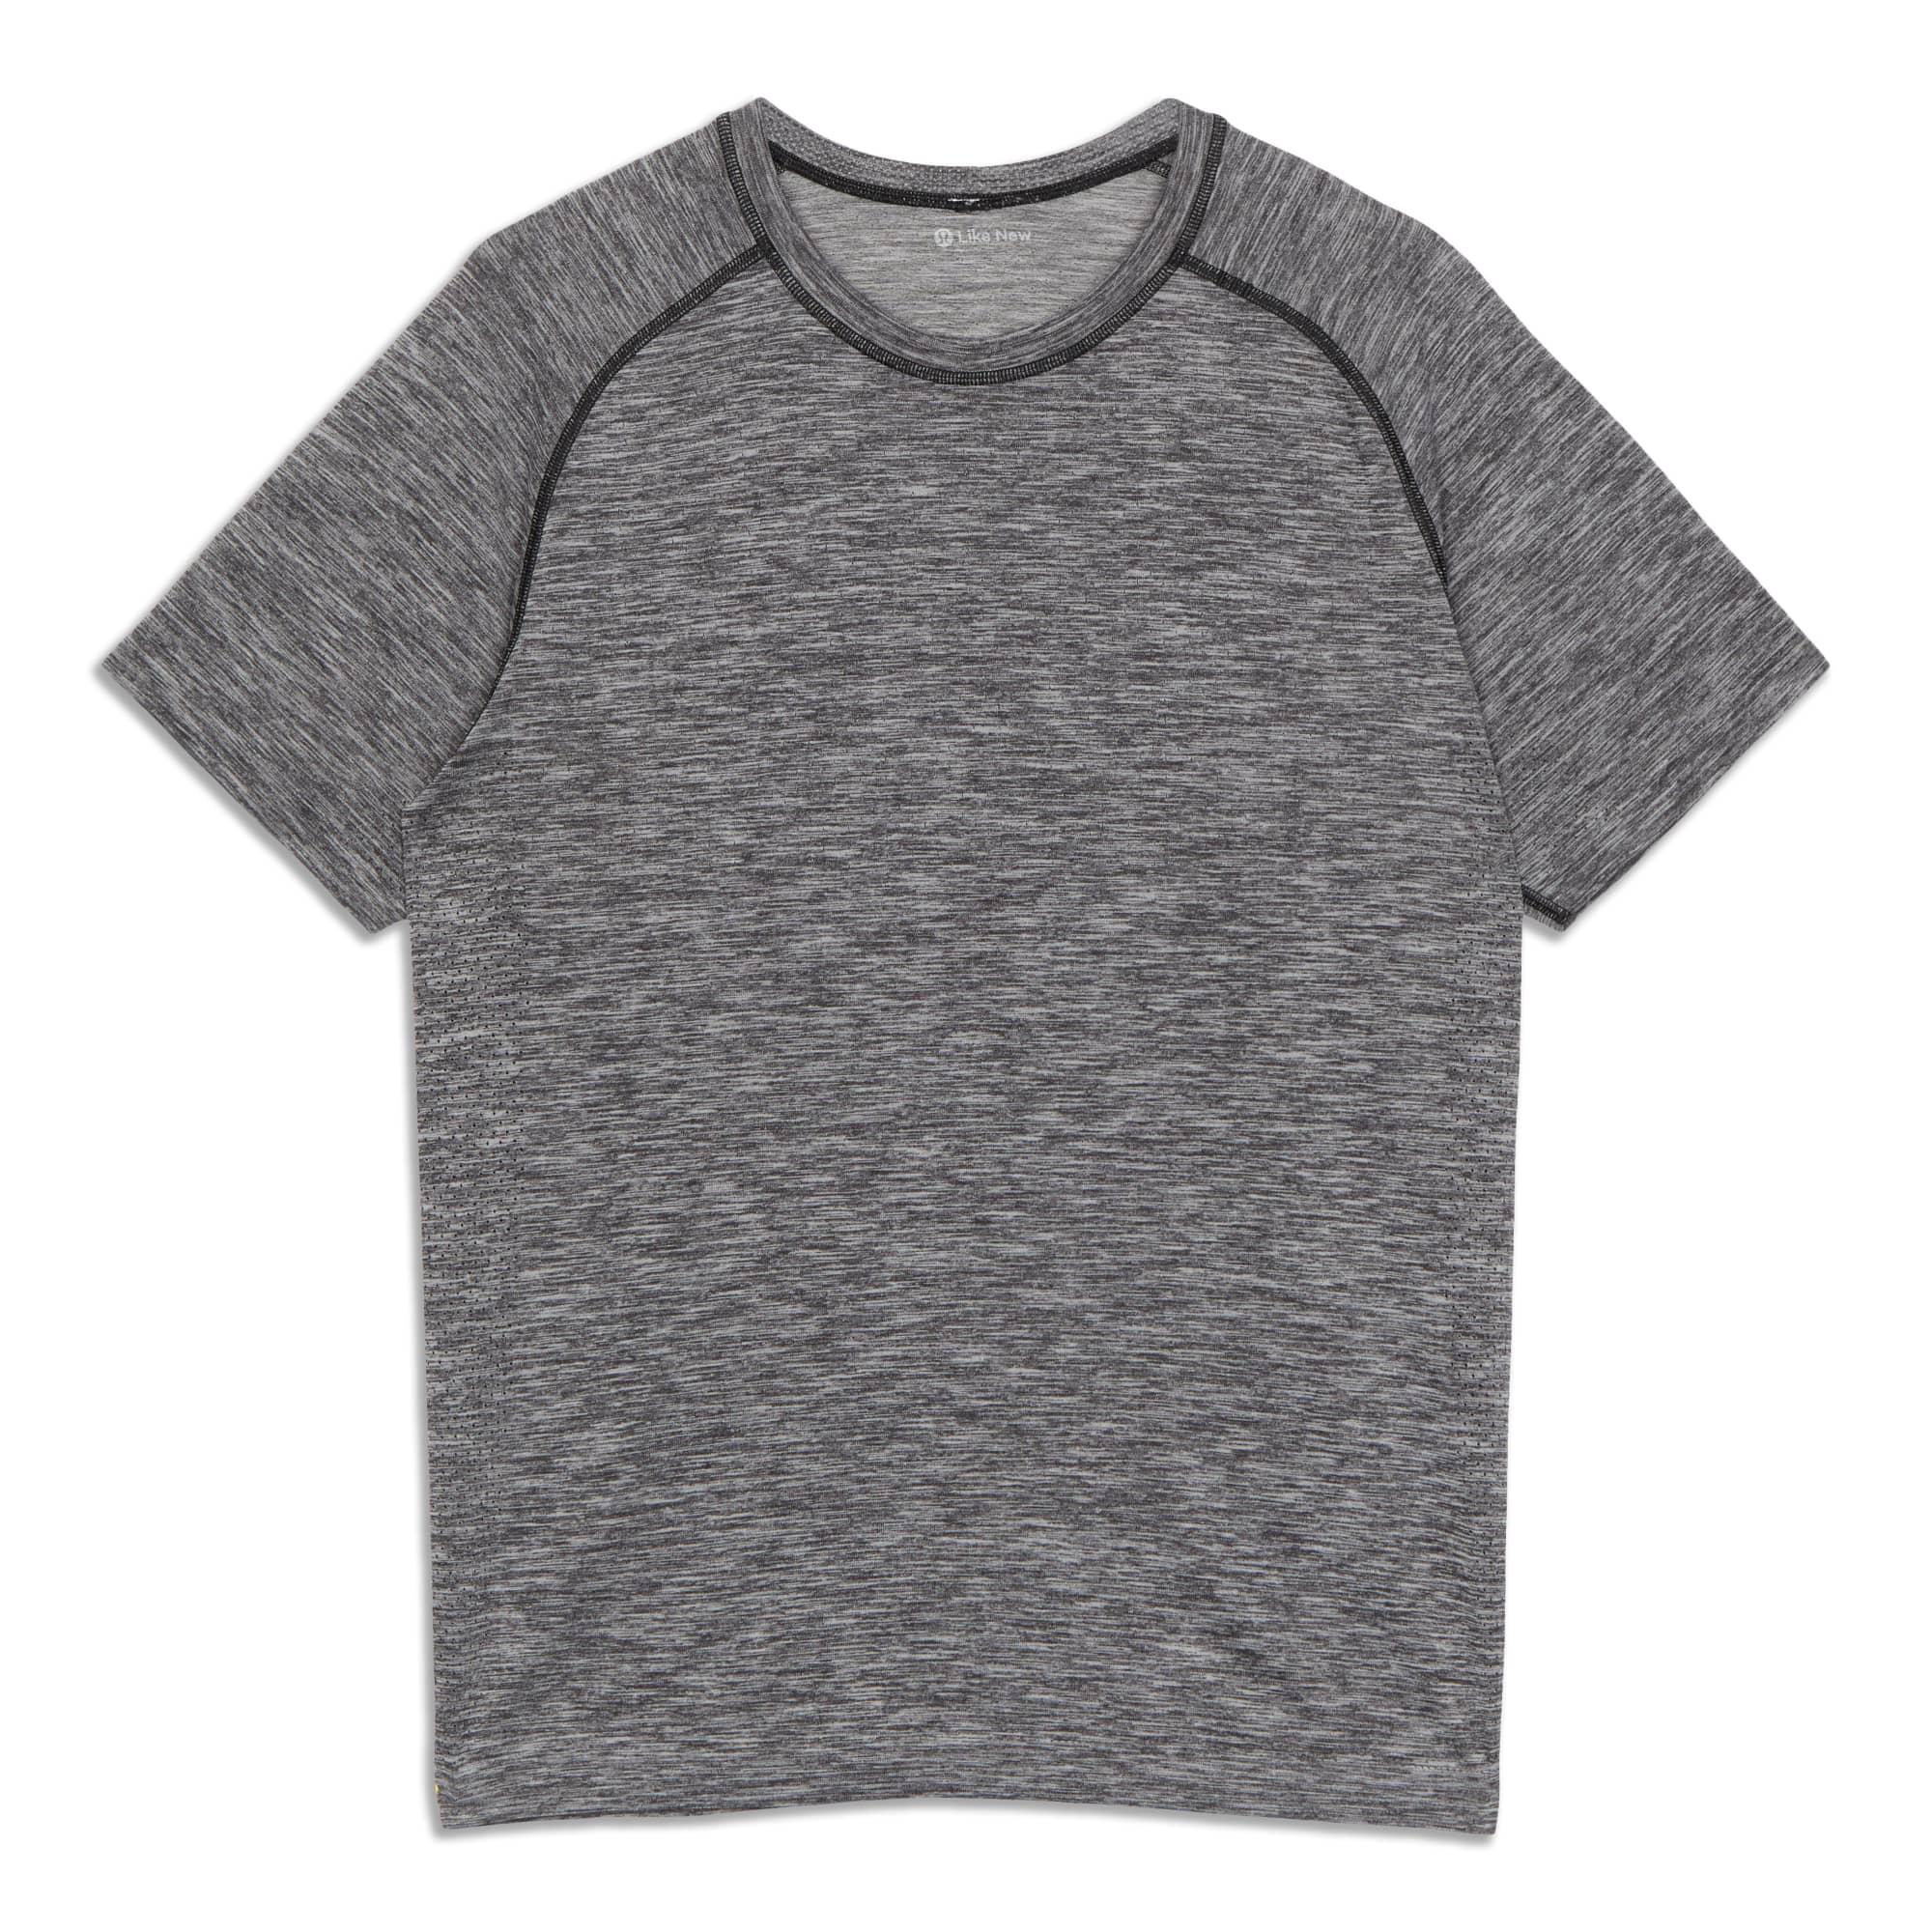 Main product image: Metal Vent Tech Surge Short Sleeve Shirt - Resale